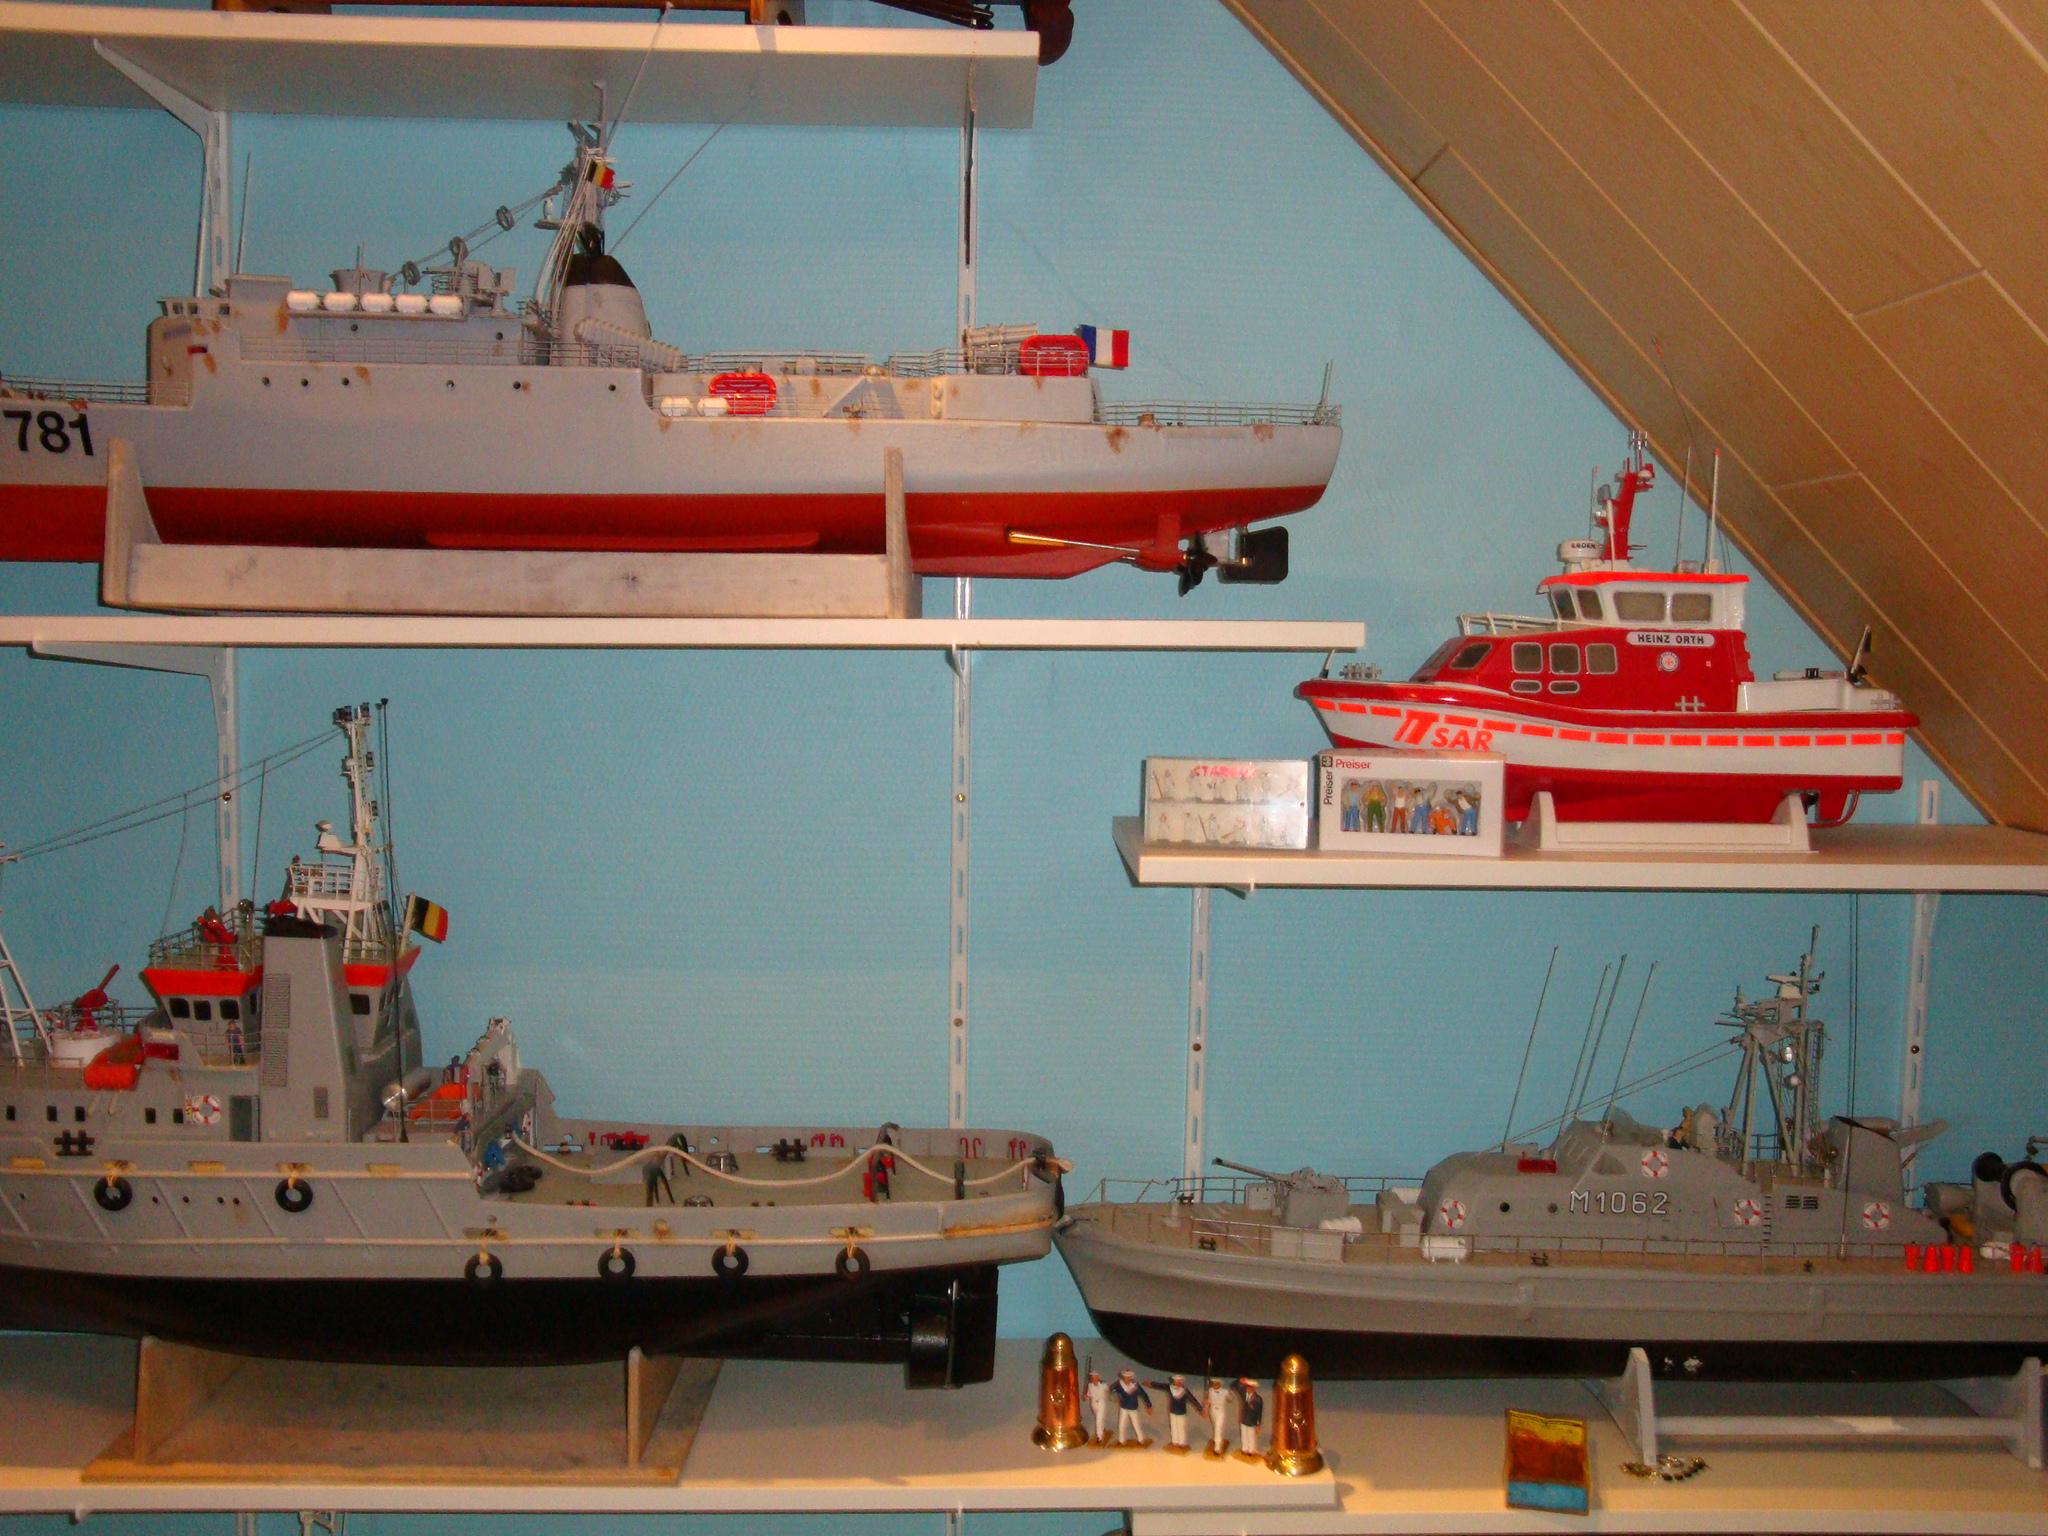 La flotte de NAVYCOOL - Page 2 100117043055895285263631